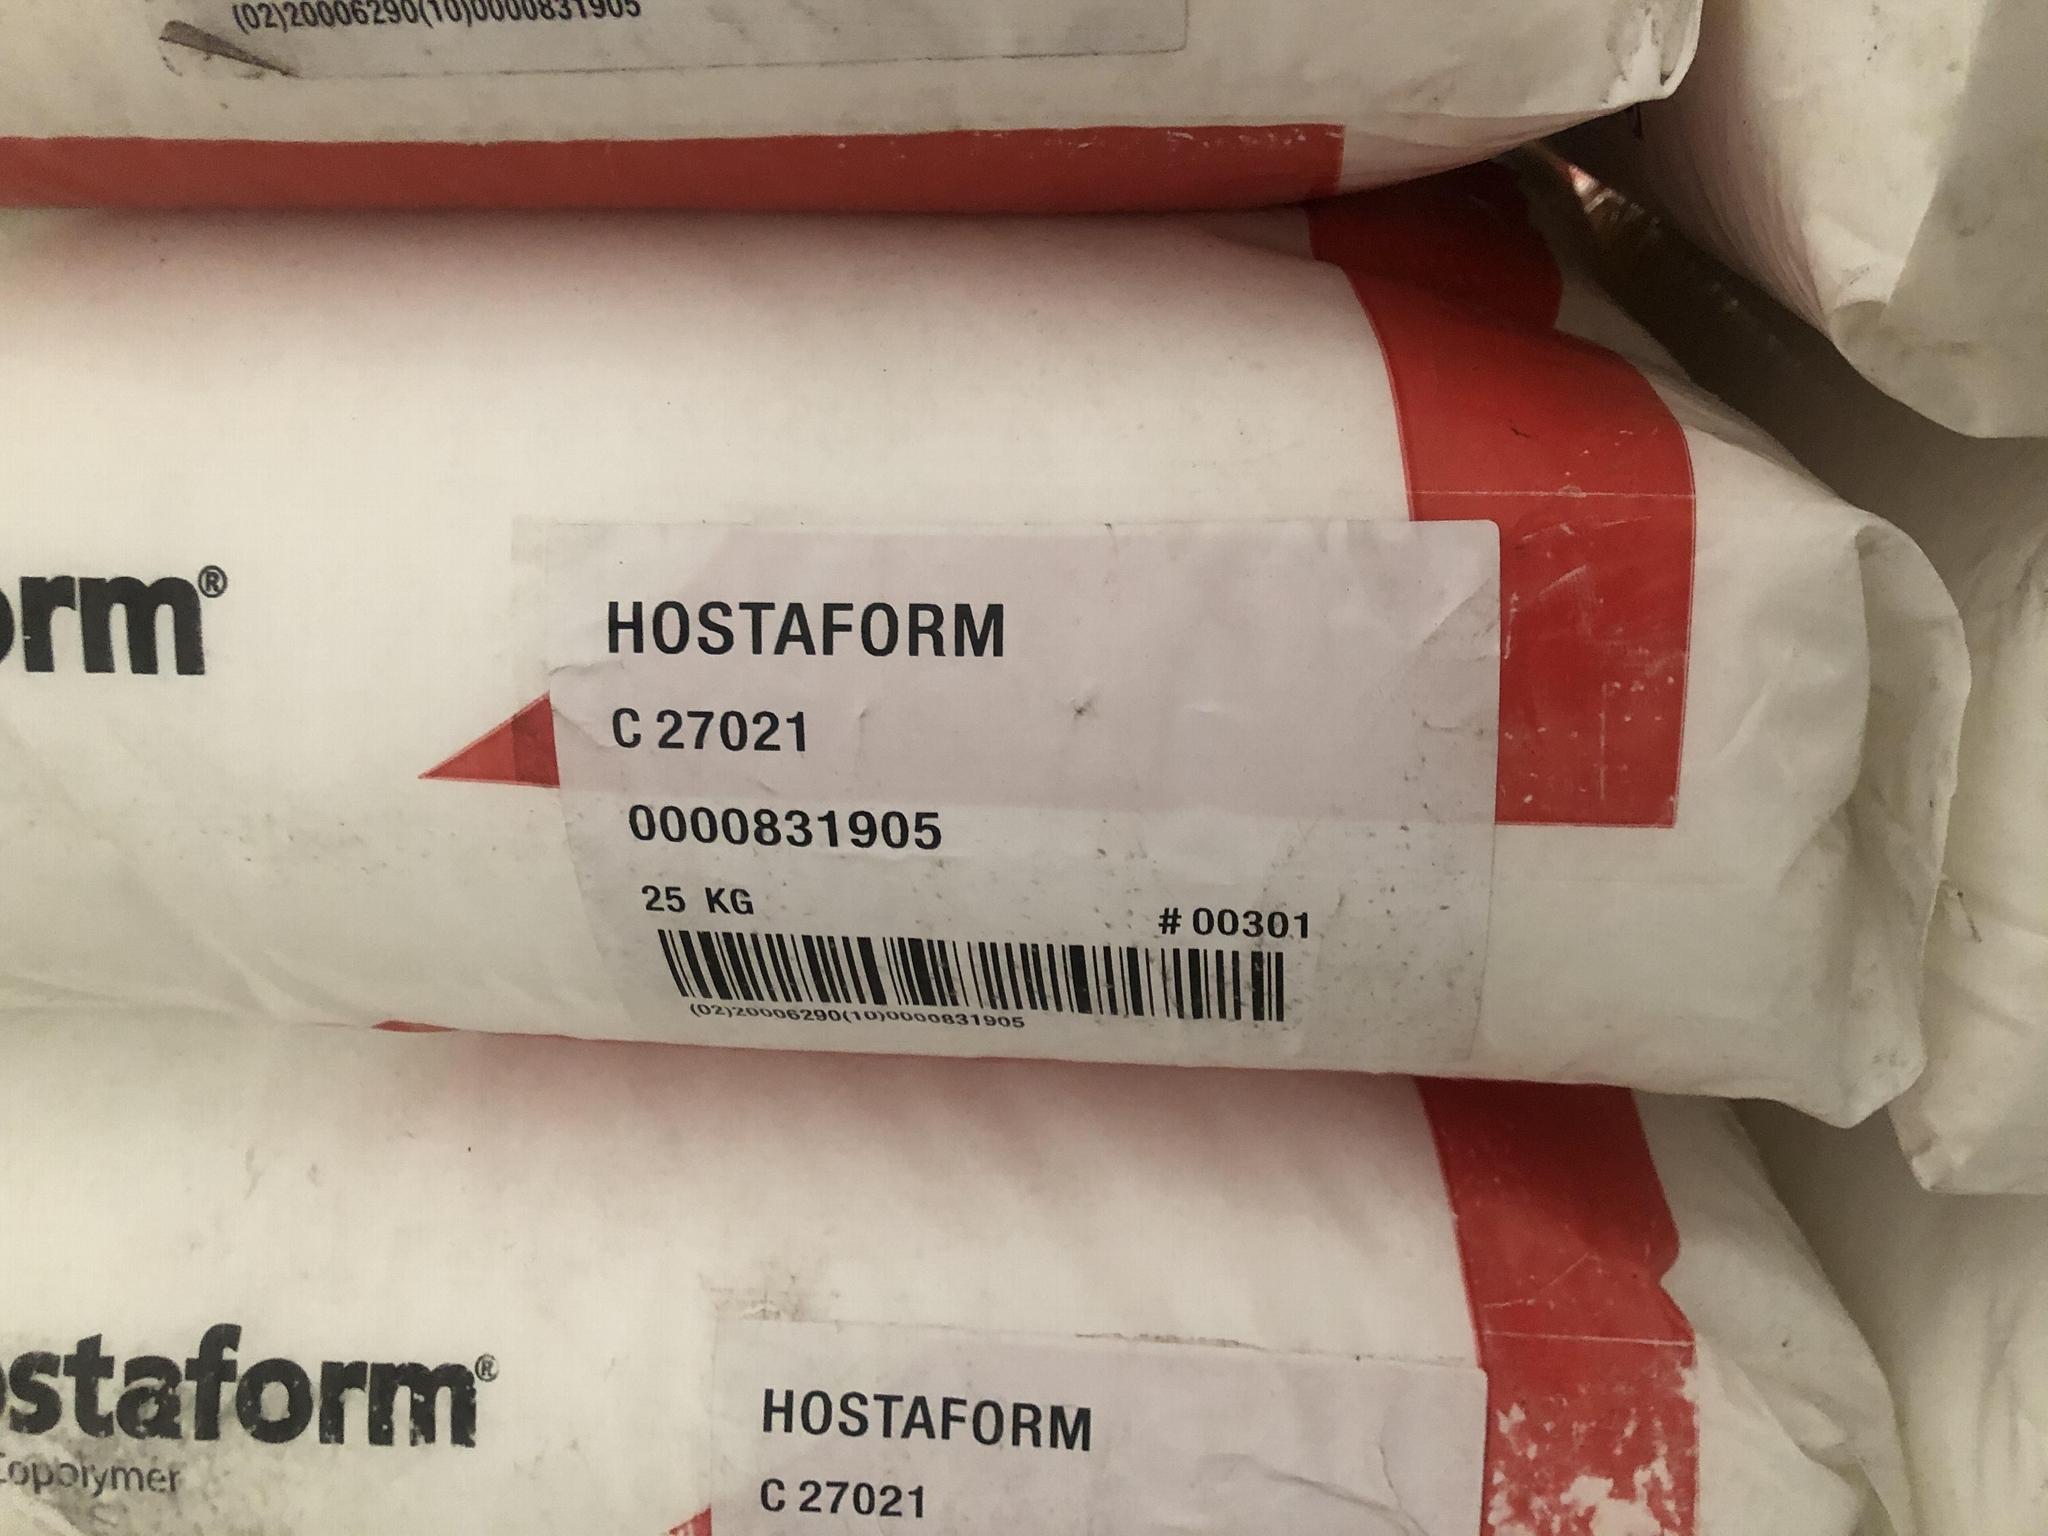 Hostaform C27021